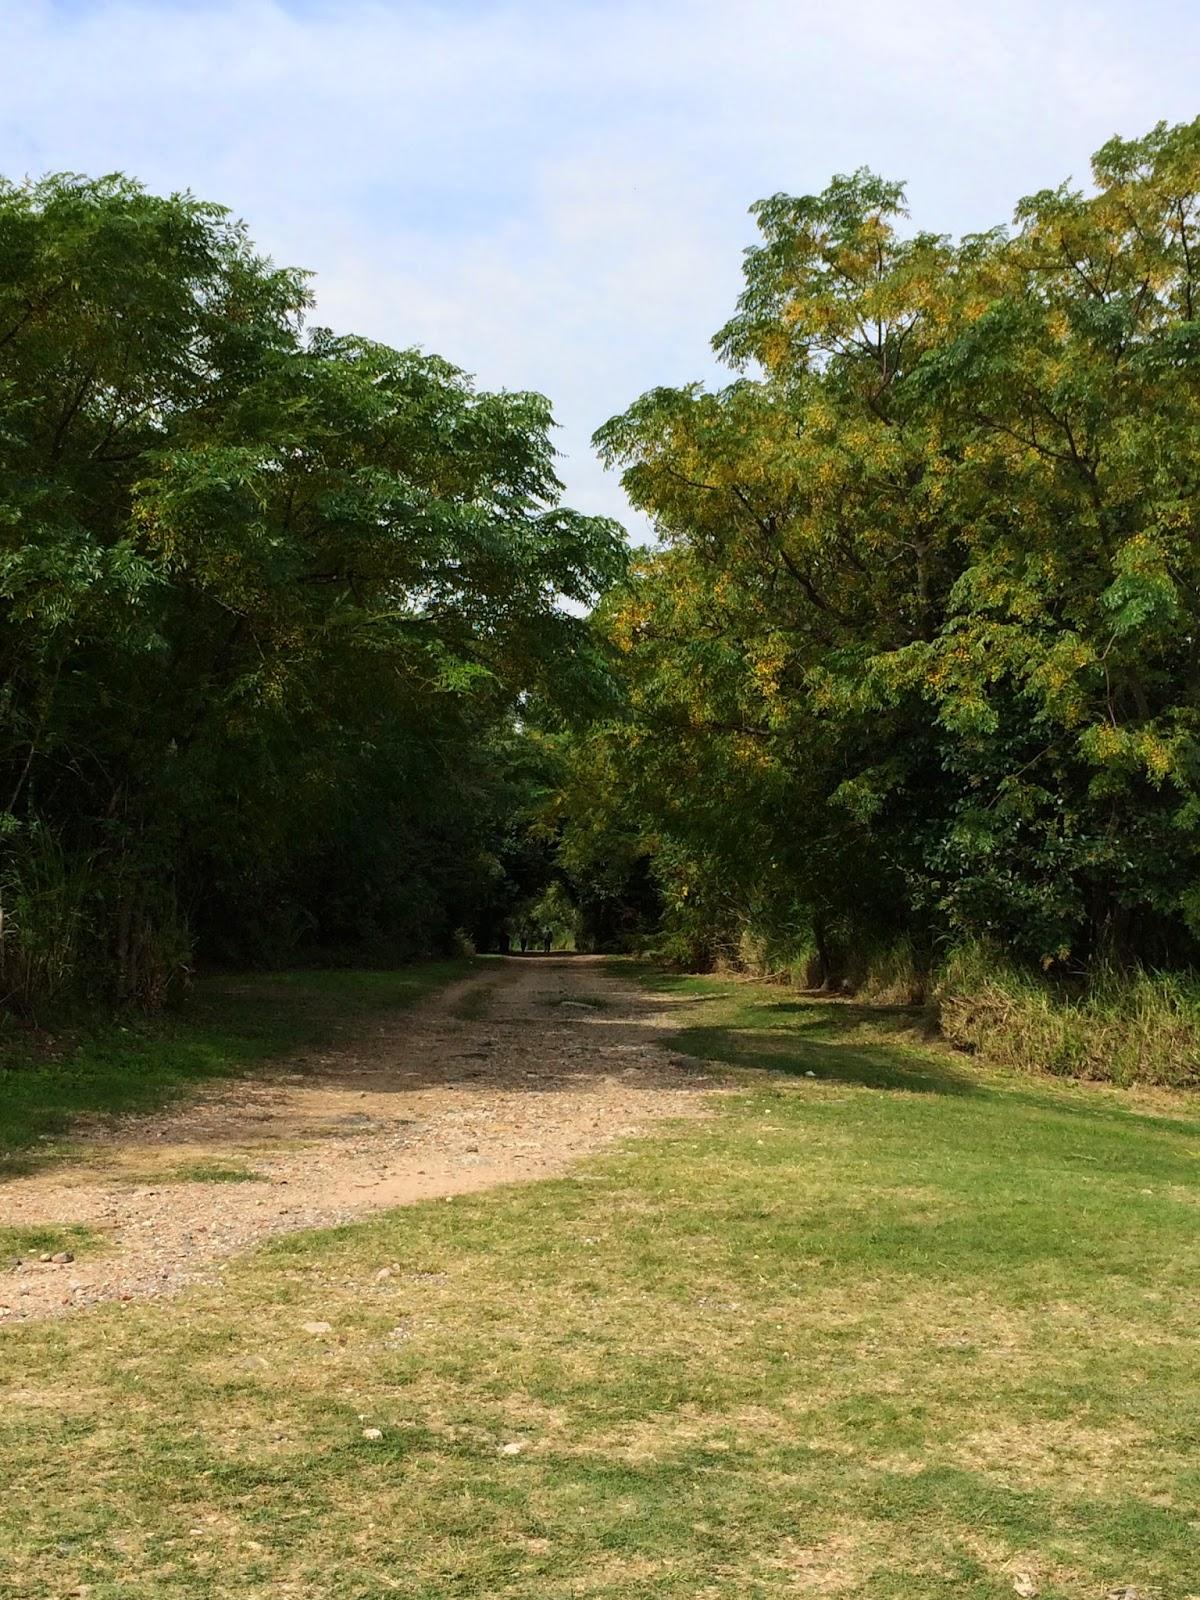 park_reserva_ecologica_argentina_6.jpg